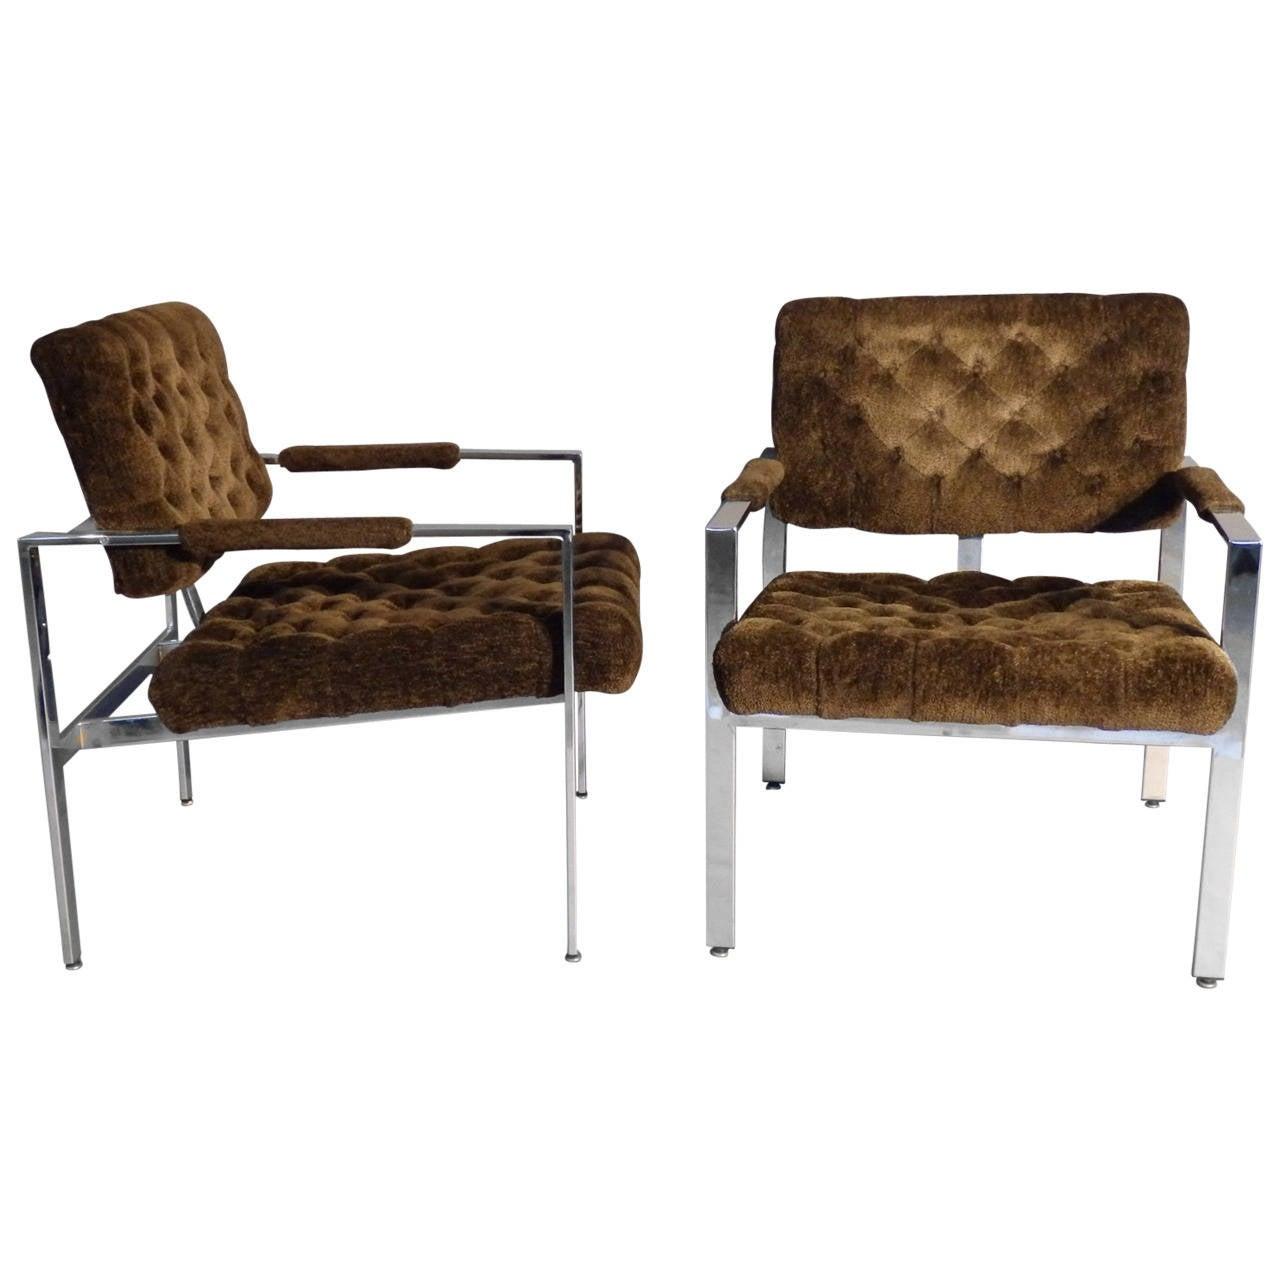 Pair of Milo Baughman Chrome Frame Chairs For Sale